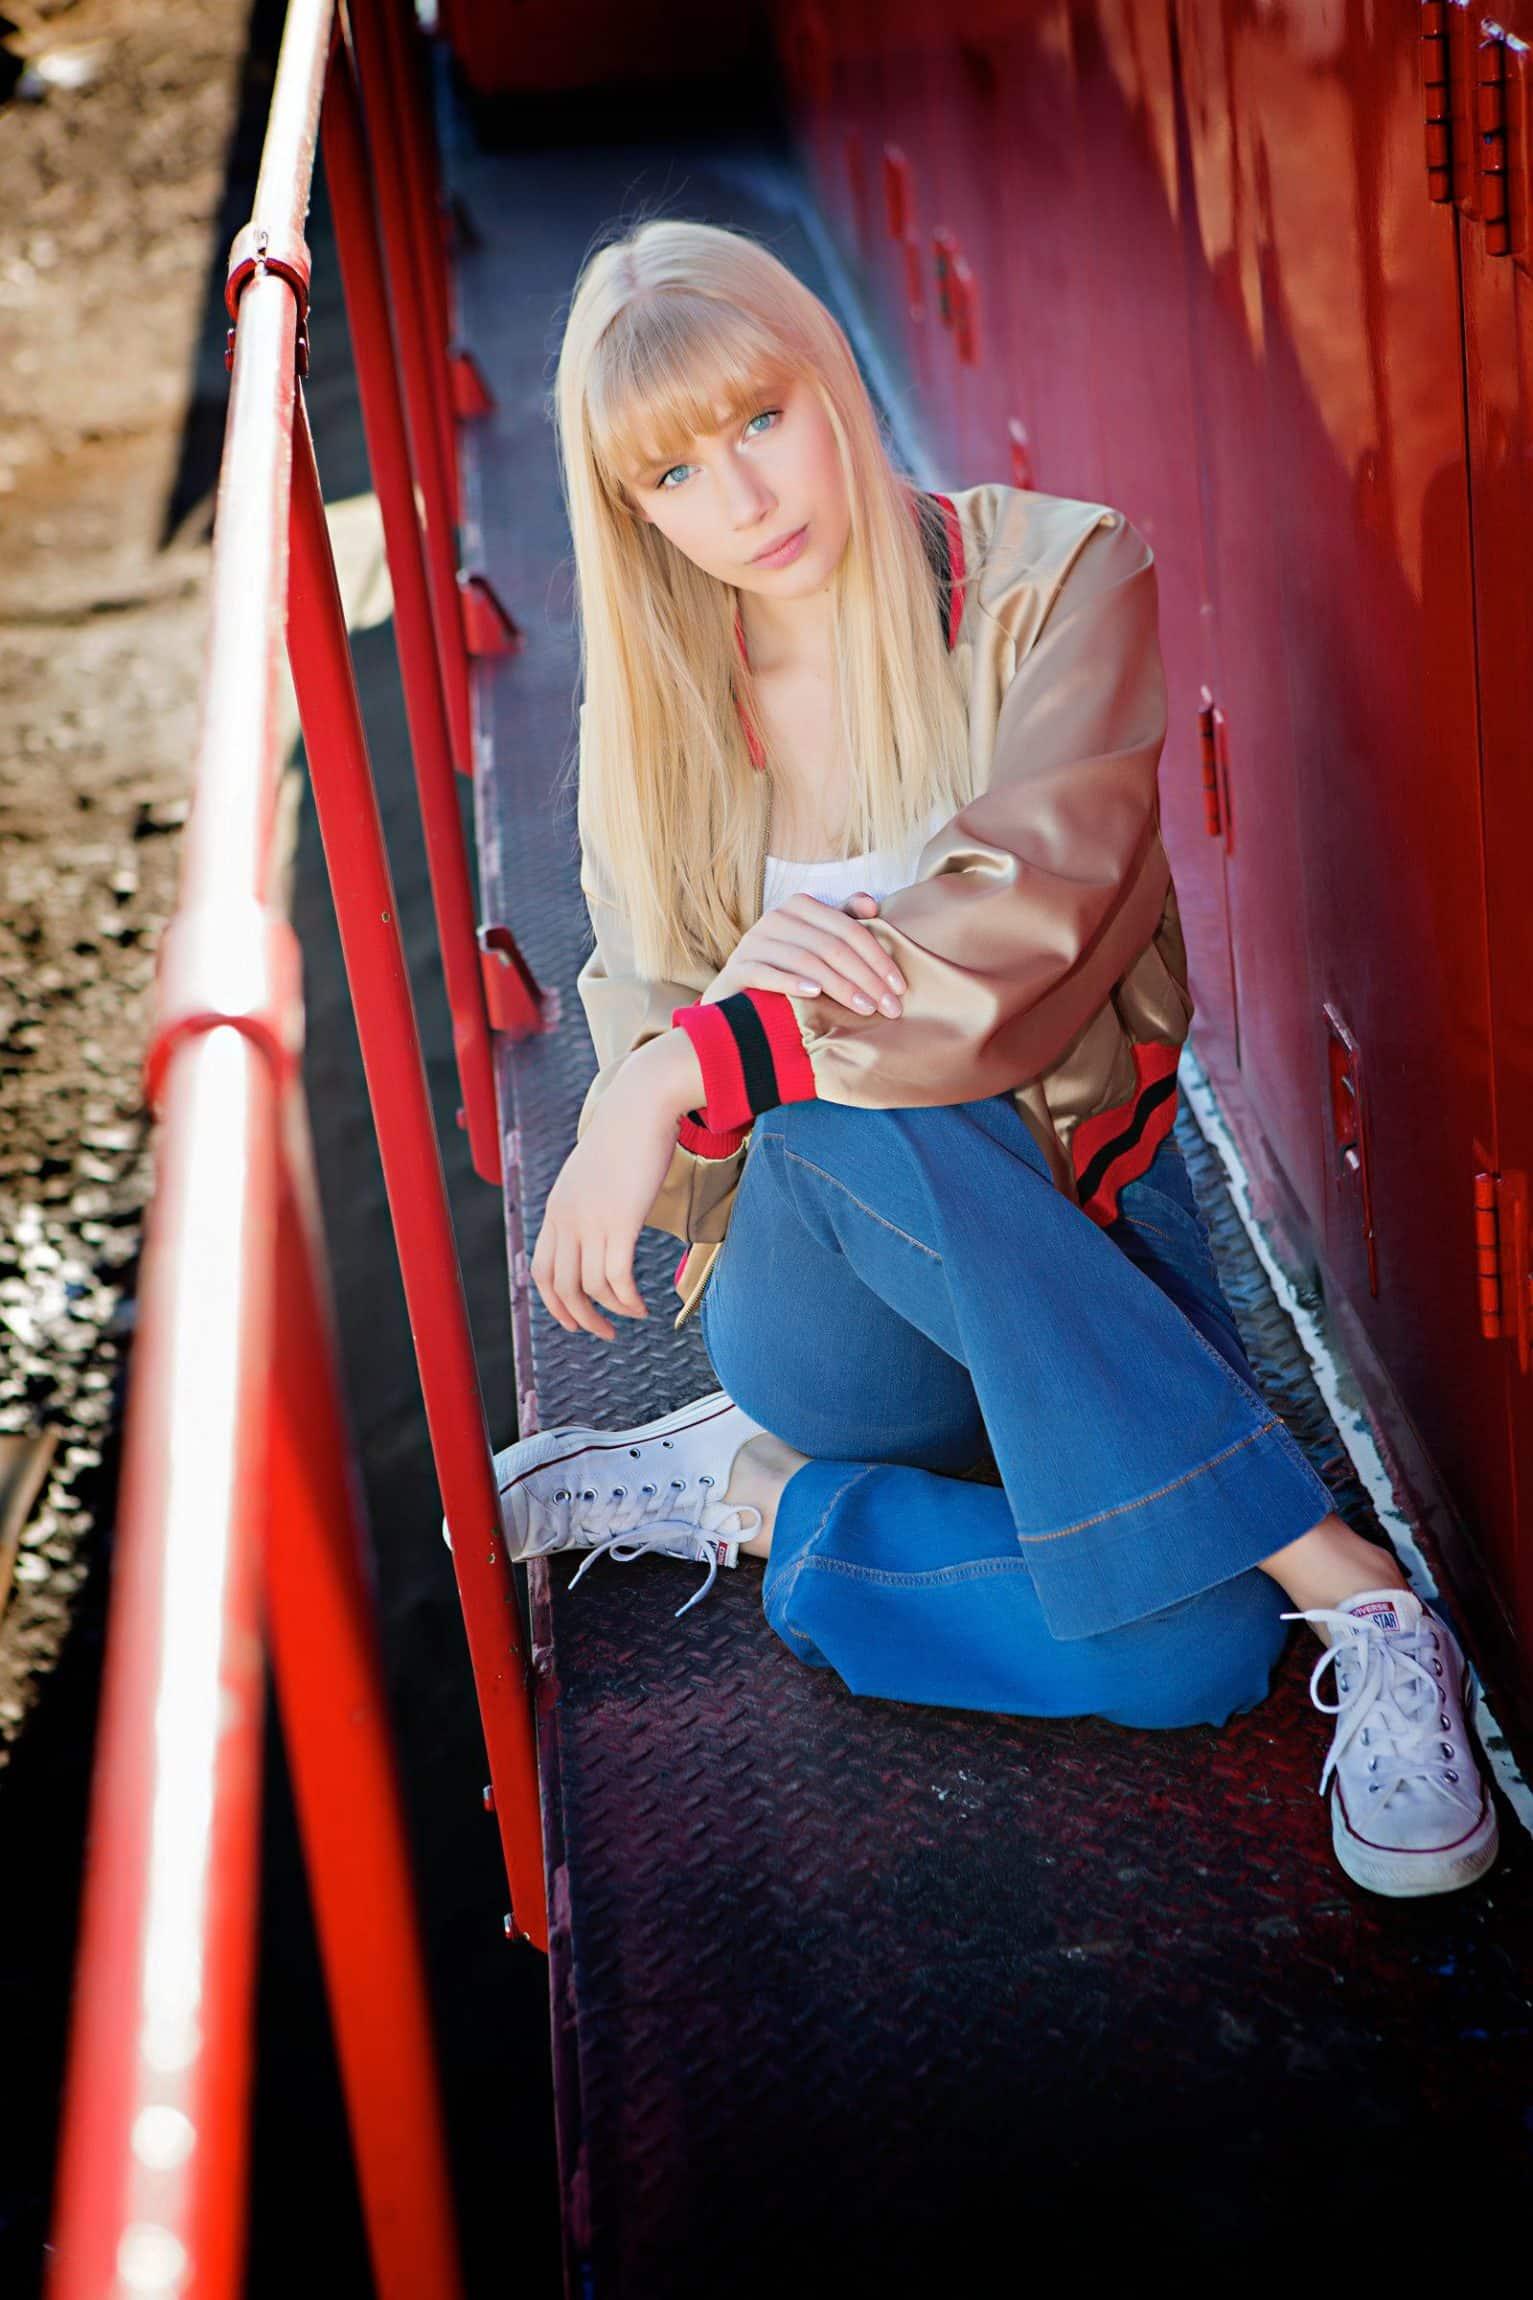 Woman sitting between railing and lockers